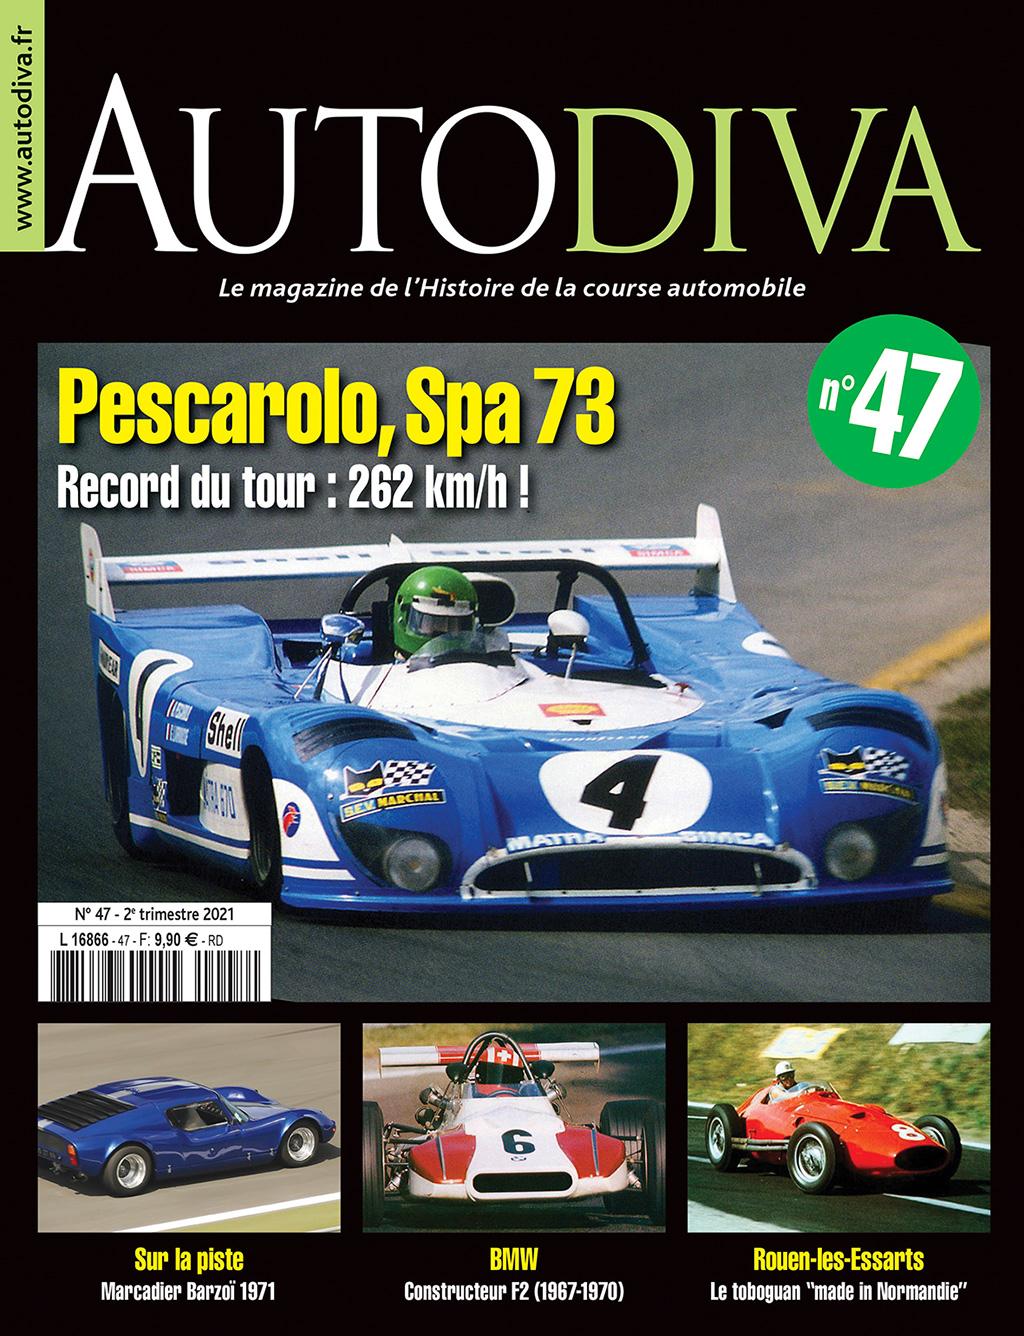 Autodiva magazine N 47